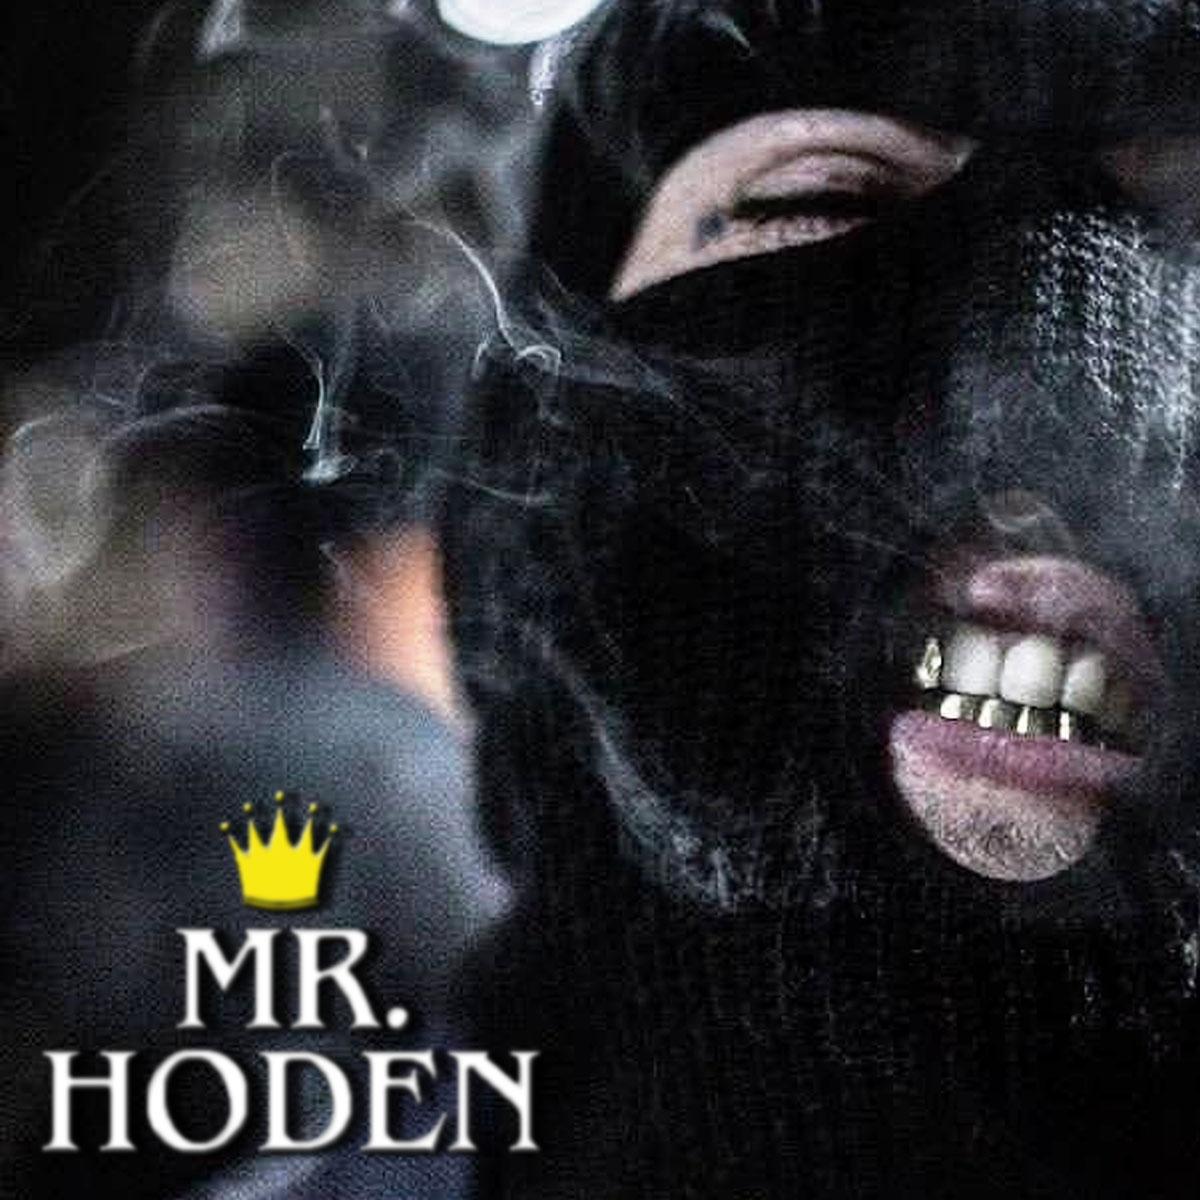 Upcoming: Mr. Hoden - Gangsta Freestyle Rap Beat 2021 [FREE BEAT]